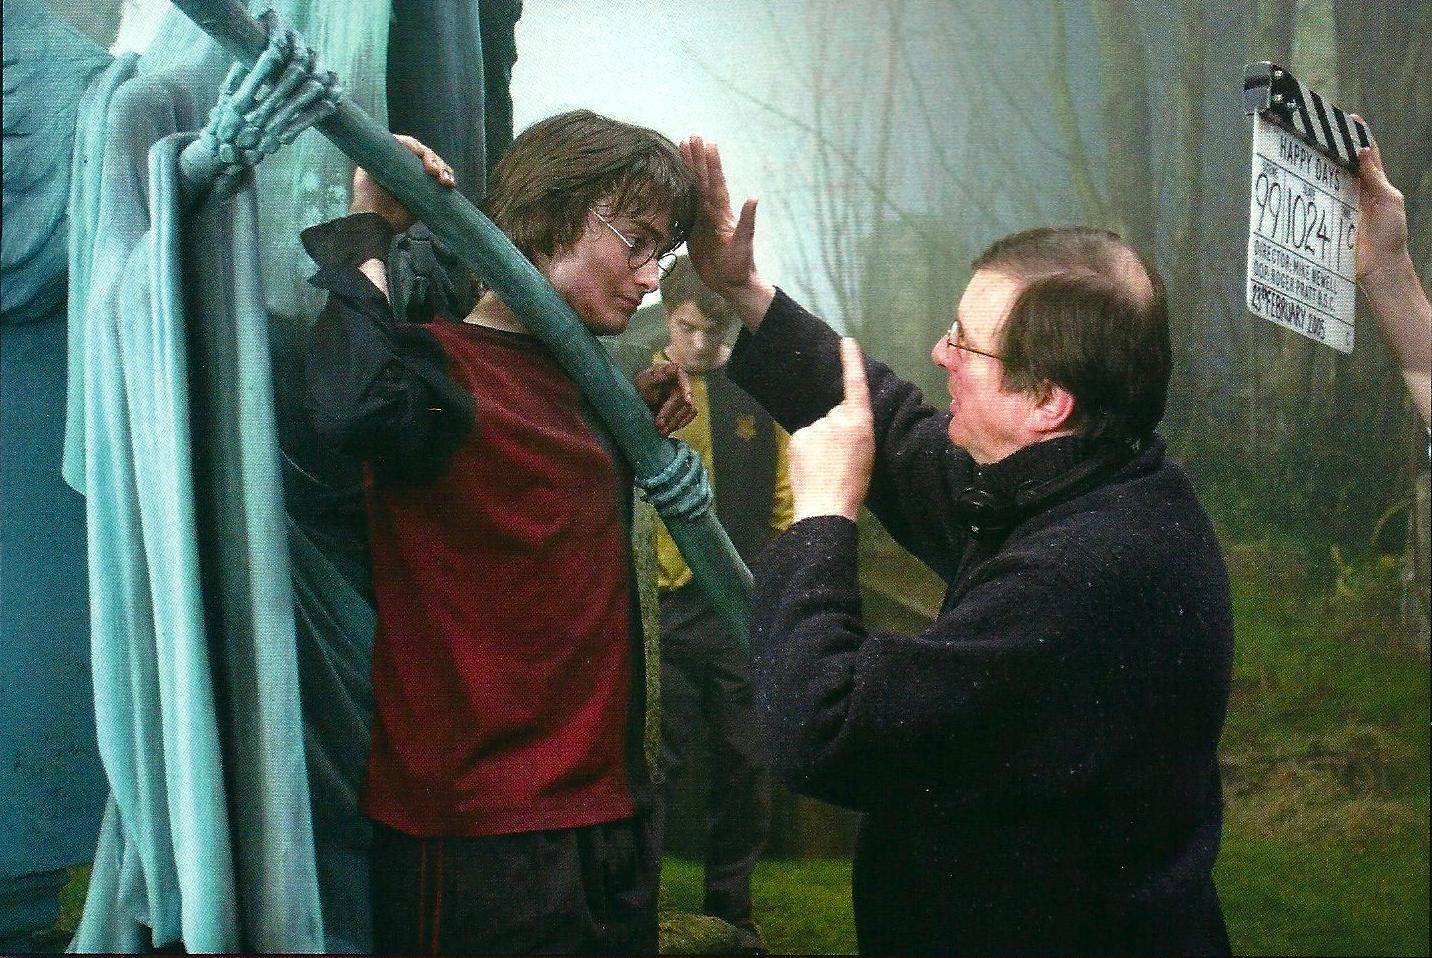 Cedric diggory thinking of rob - Harry potter et la coupe de feu cedric diggory ...